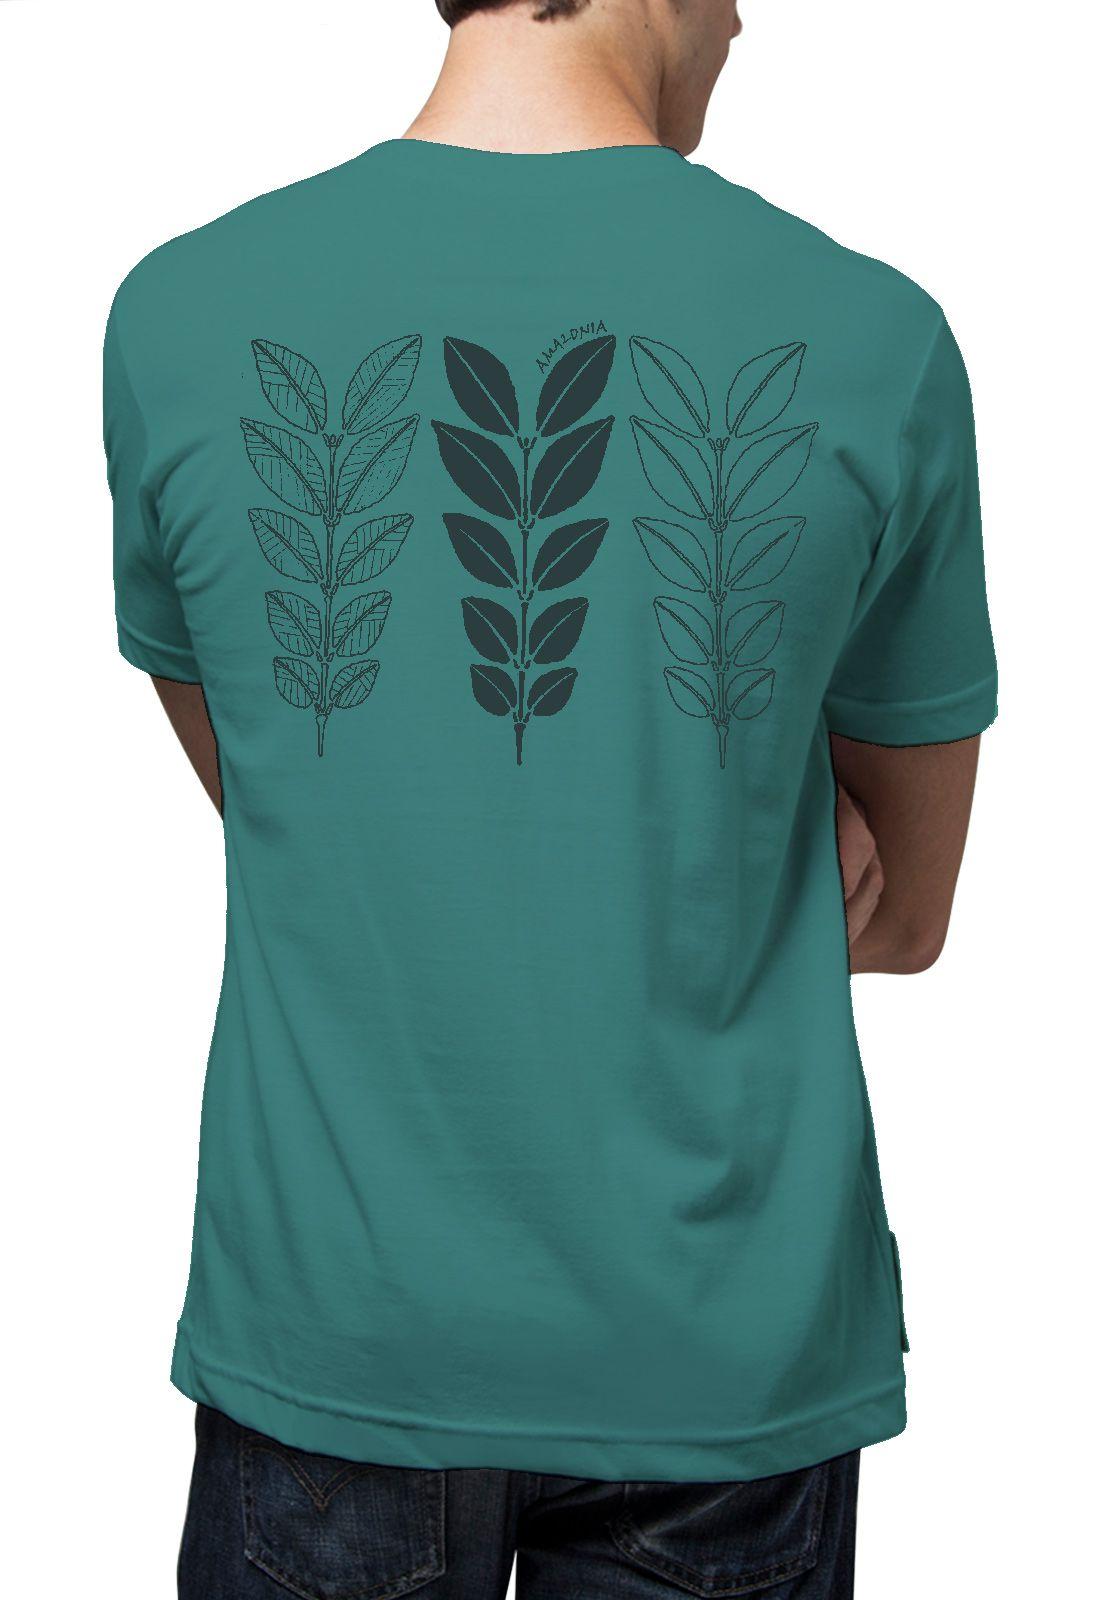 Camiseta Amazônia Biodiversidade - Azul